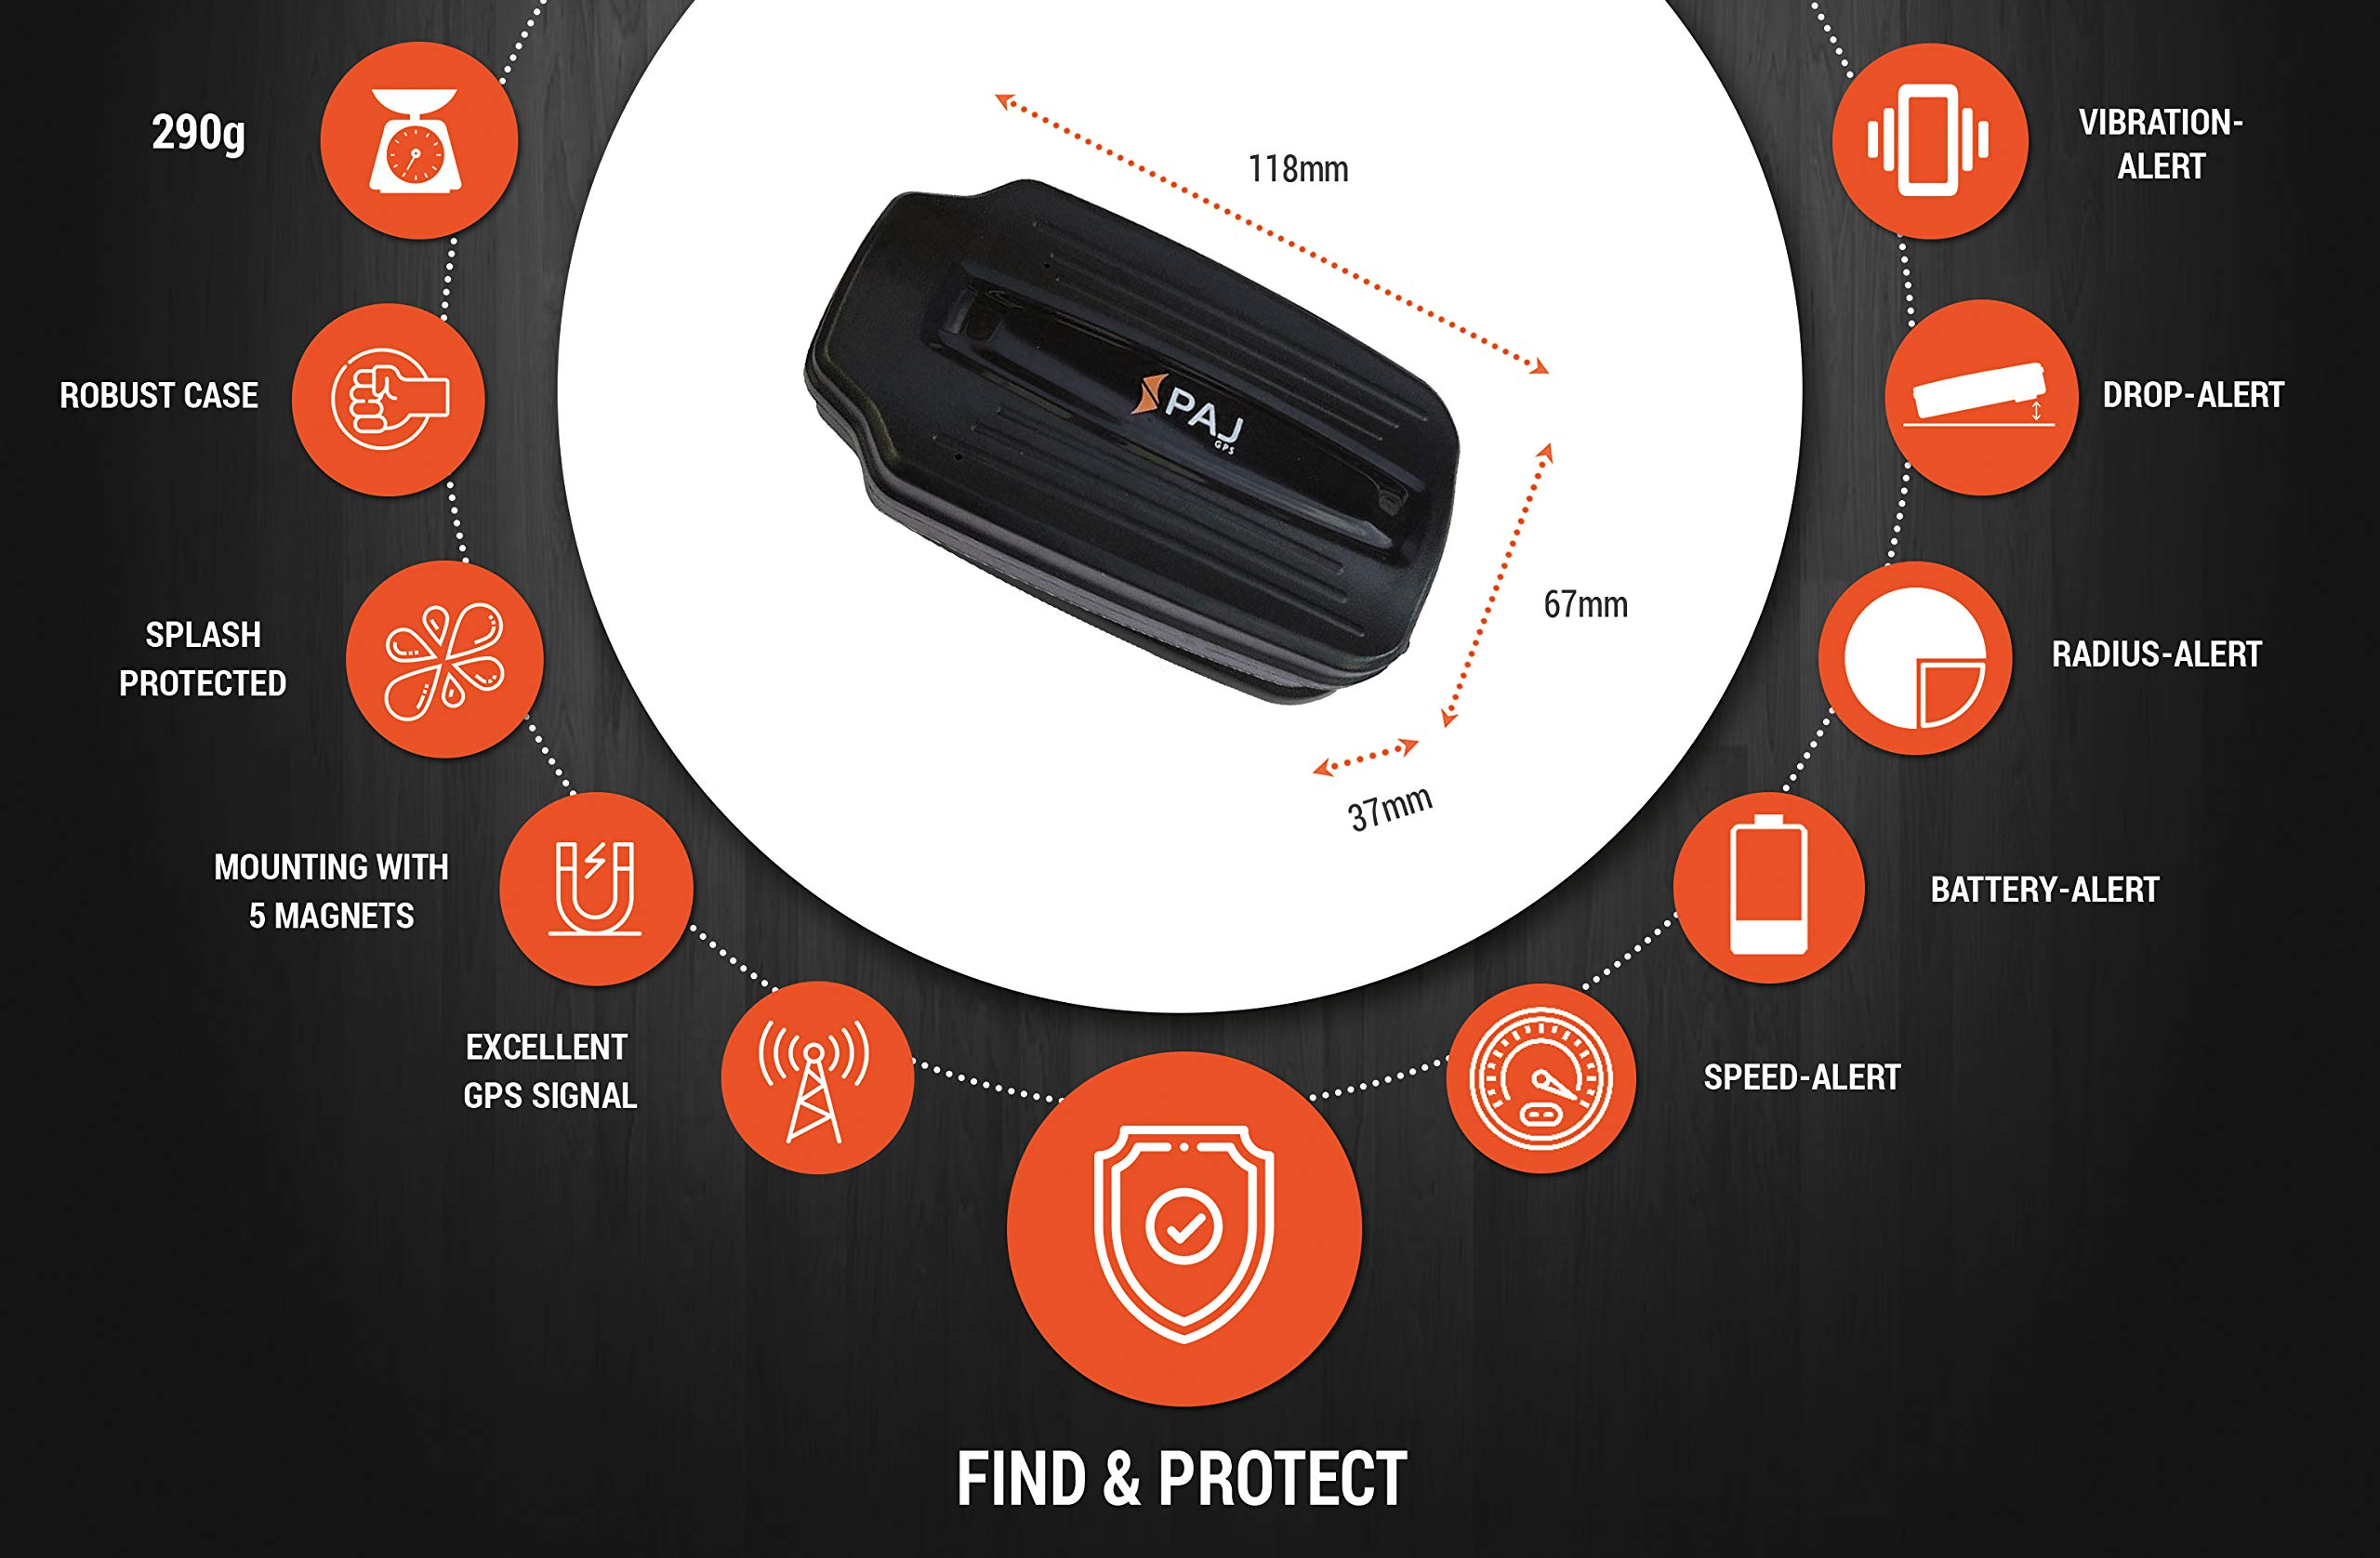 PAJ-GPS-Power-Finder-GPS-Tracker-inkl-Magneten-als-Diebstahlschutz-fr-Auto-Wohnmobil-Boot-mit-40-Tage-Li-ion-Akku-Ortung-mit-App